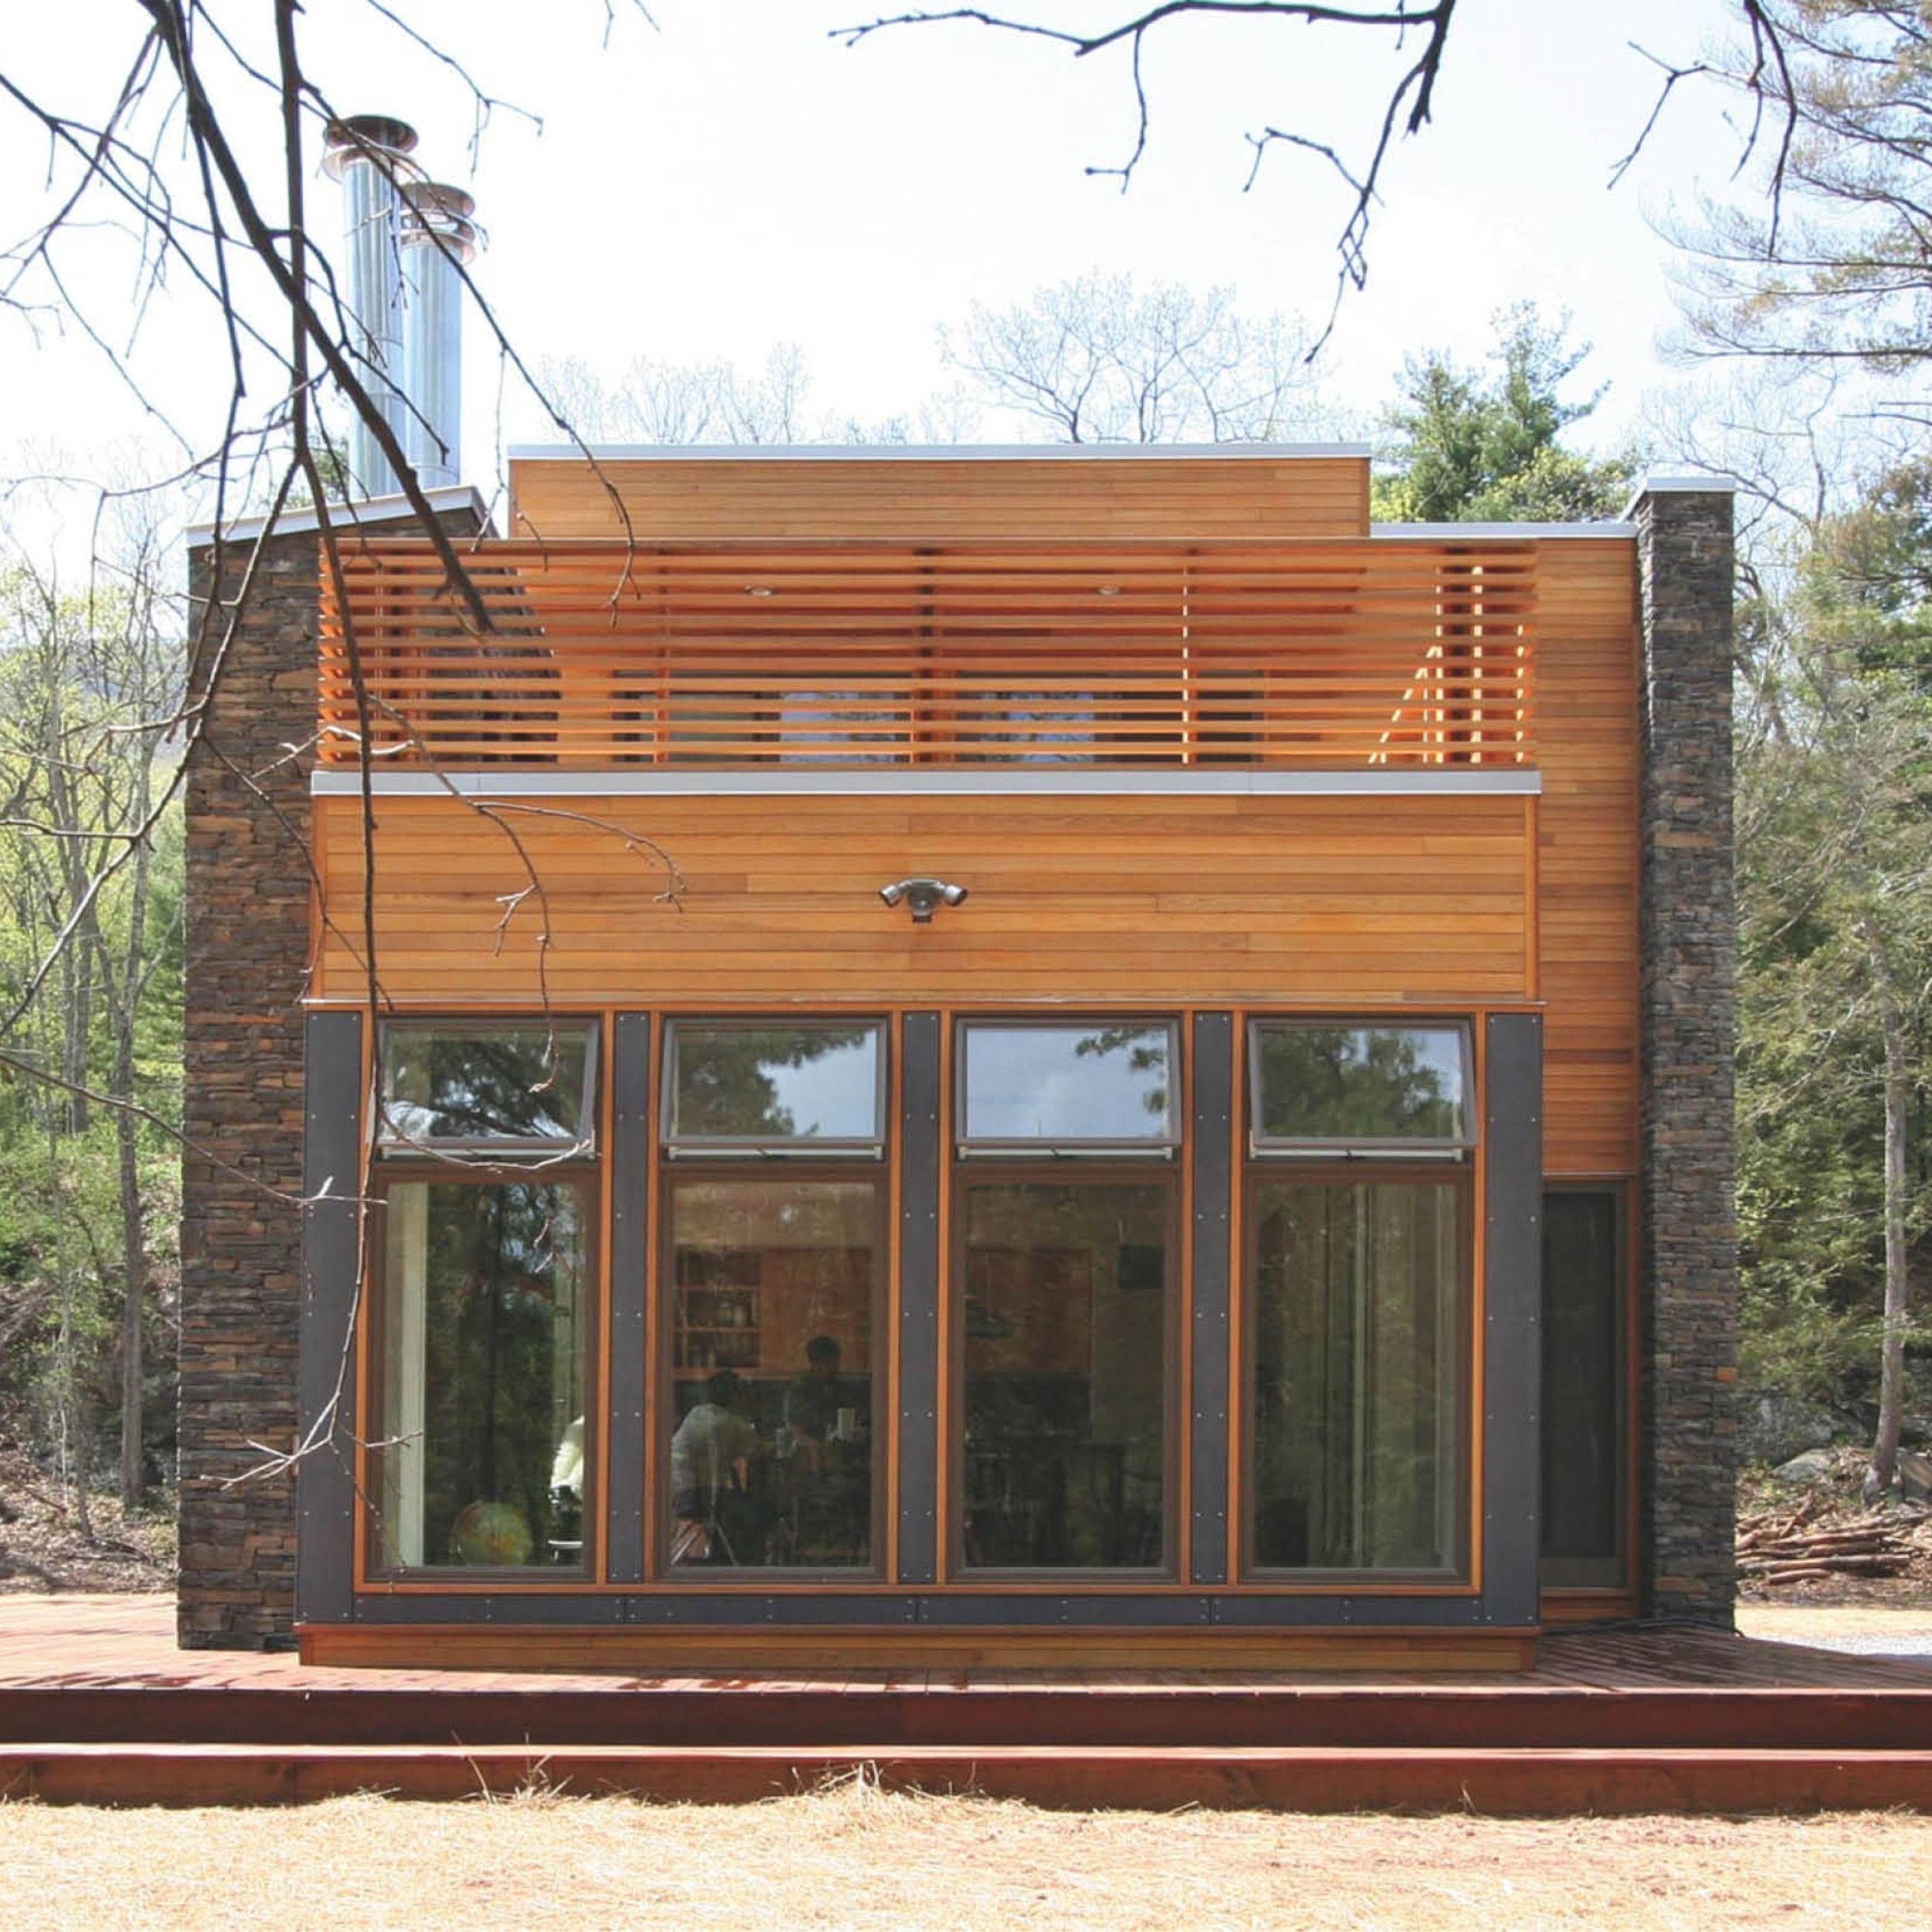 Modularhome Designs: Modern Modular Homes, Modular